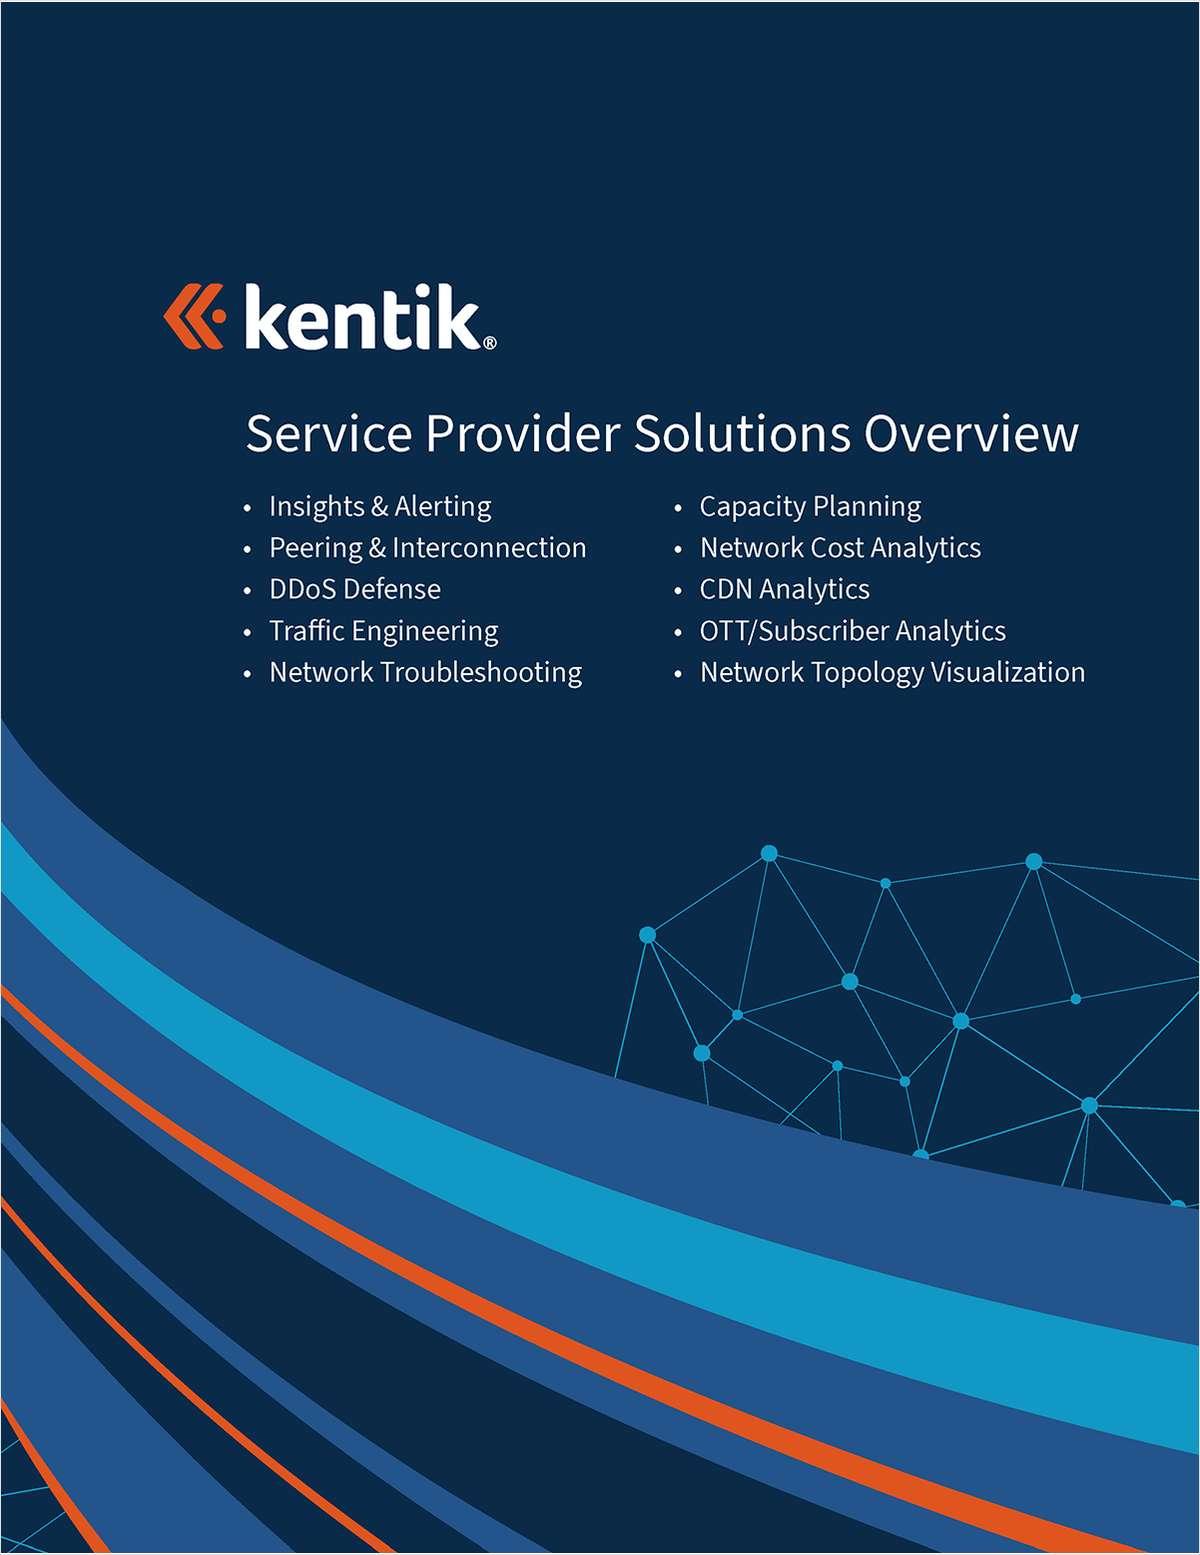 Kentik Network Service Provider Solution Overview